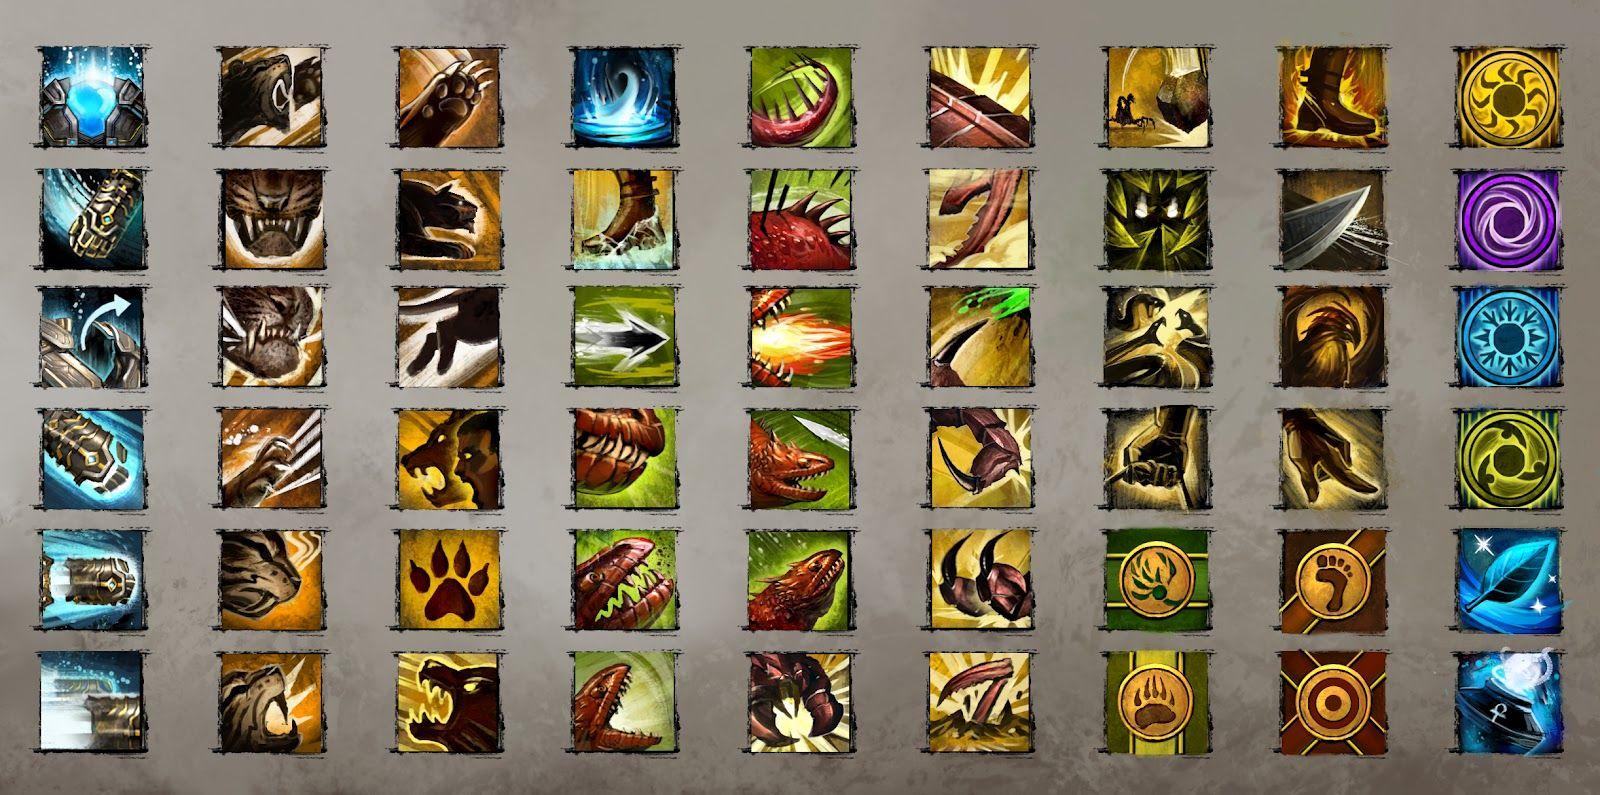 Dave Bolton: Guild Wars 2 Concepts